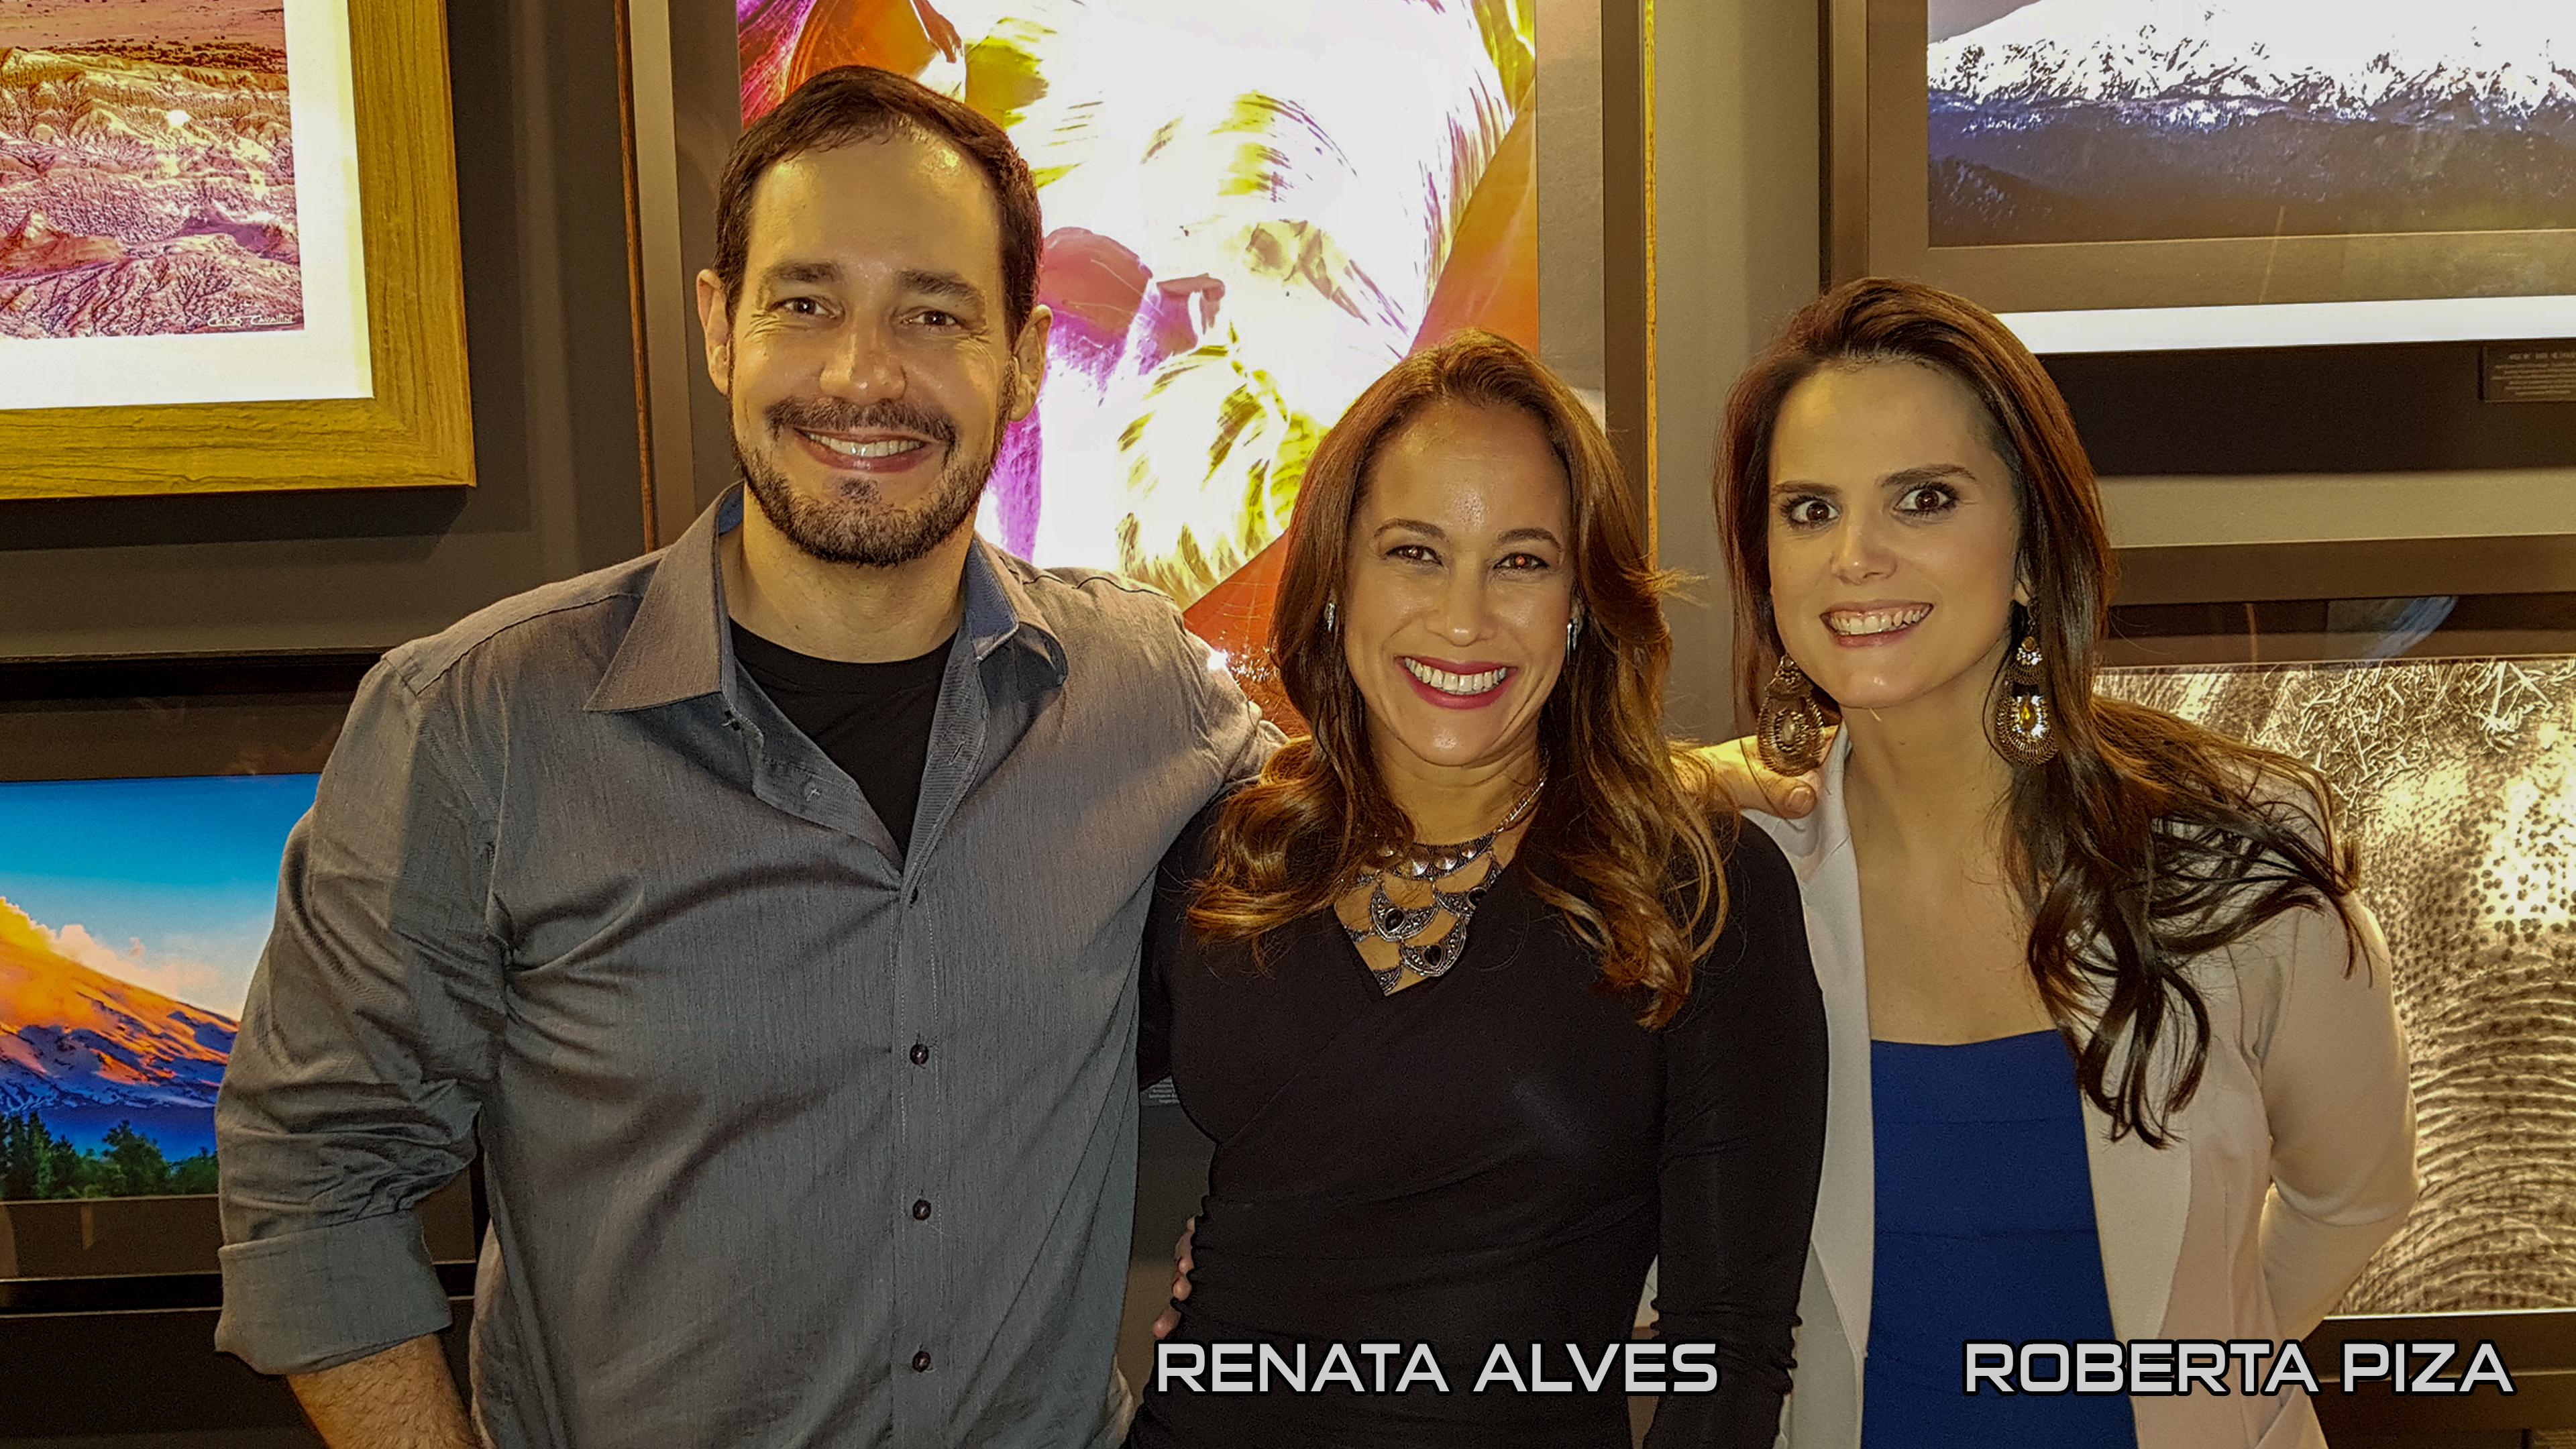 Renata Alves e Roberta Piza